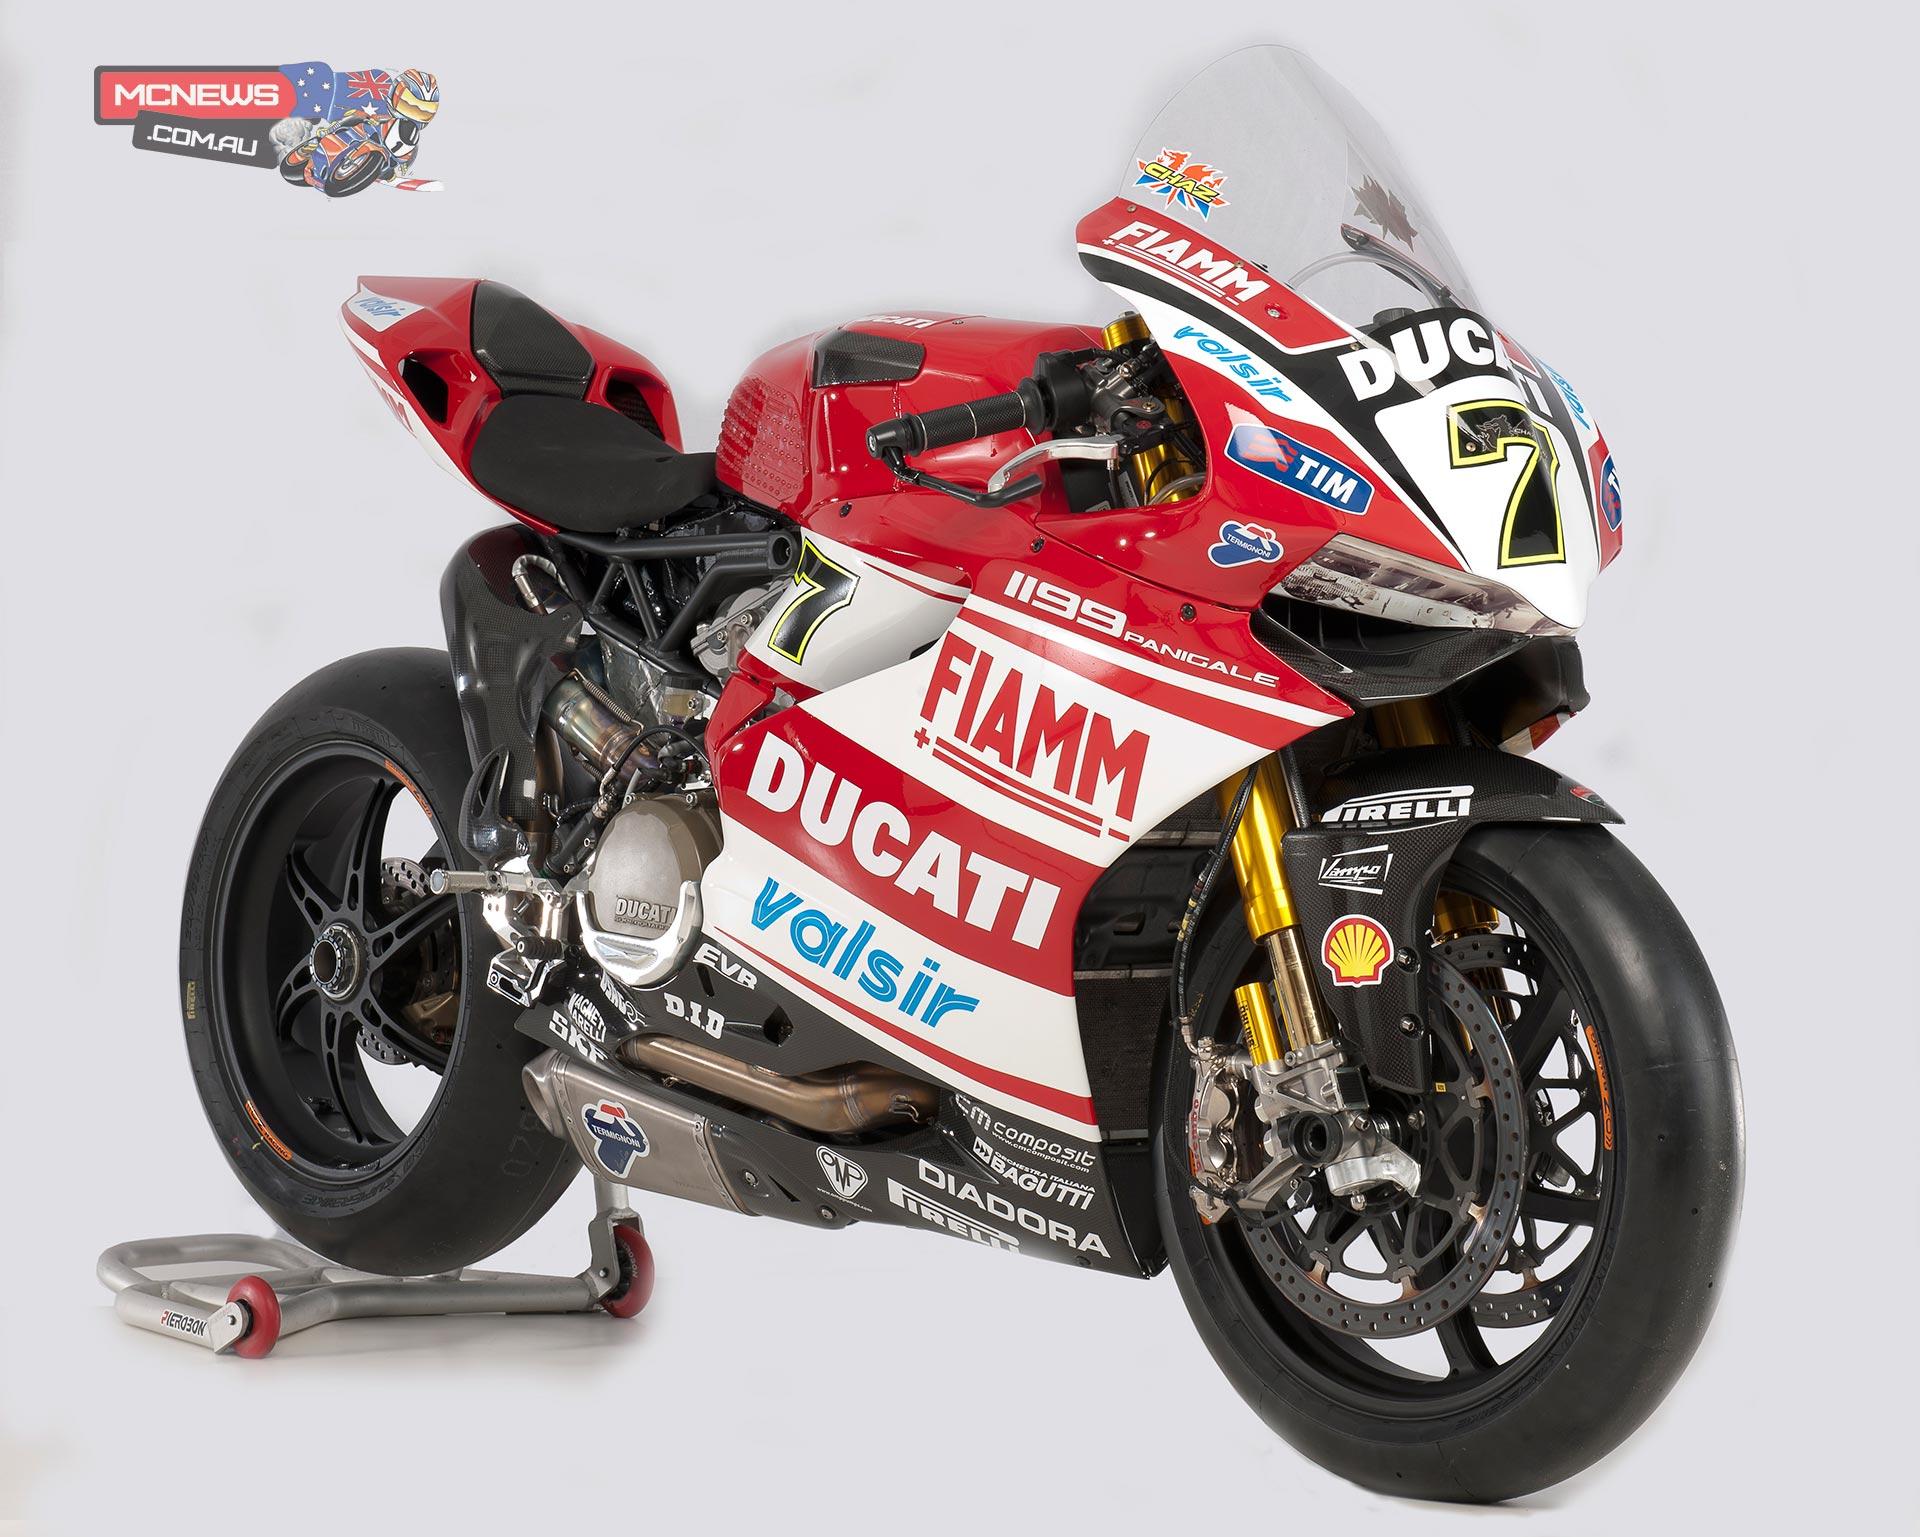 Ducati World Superbike 2014 Team Launch